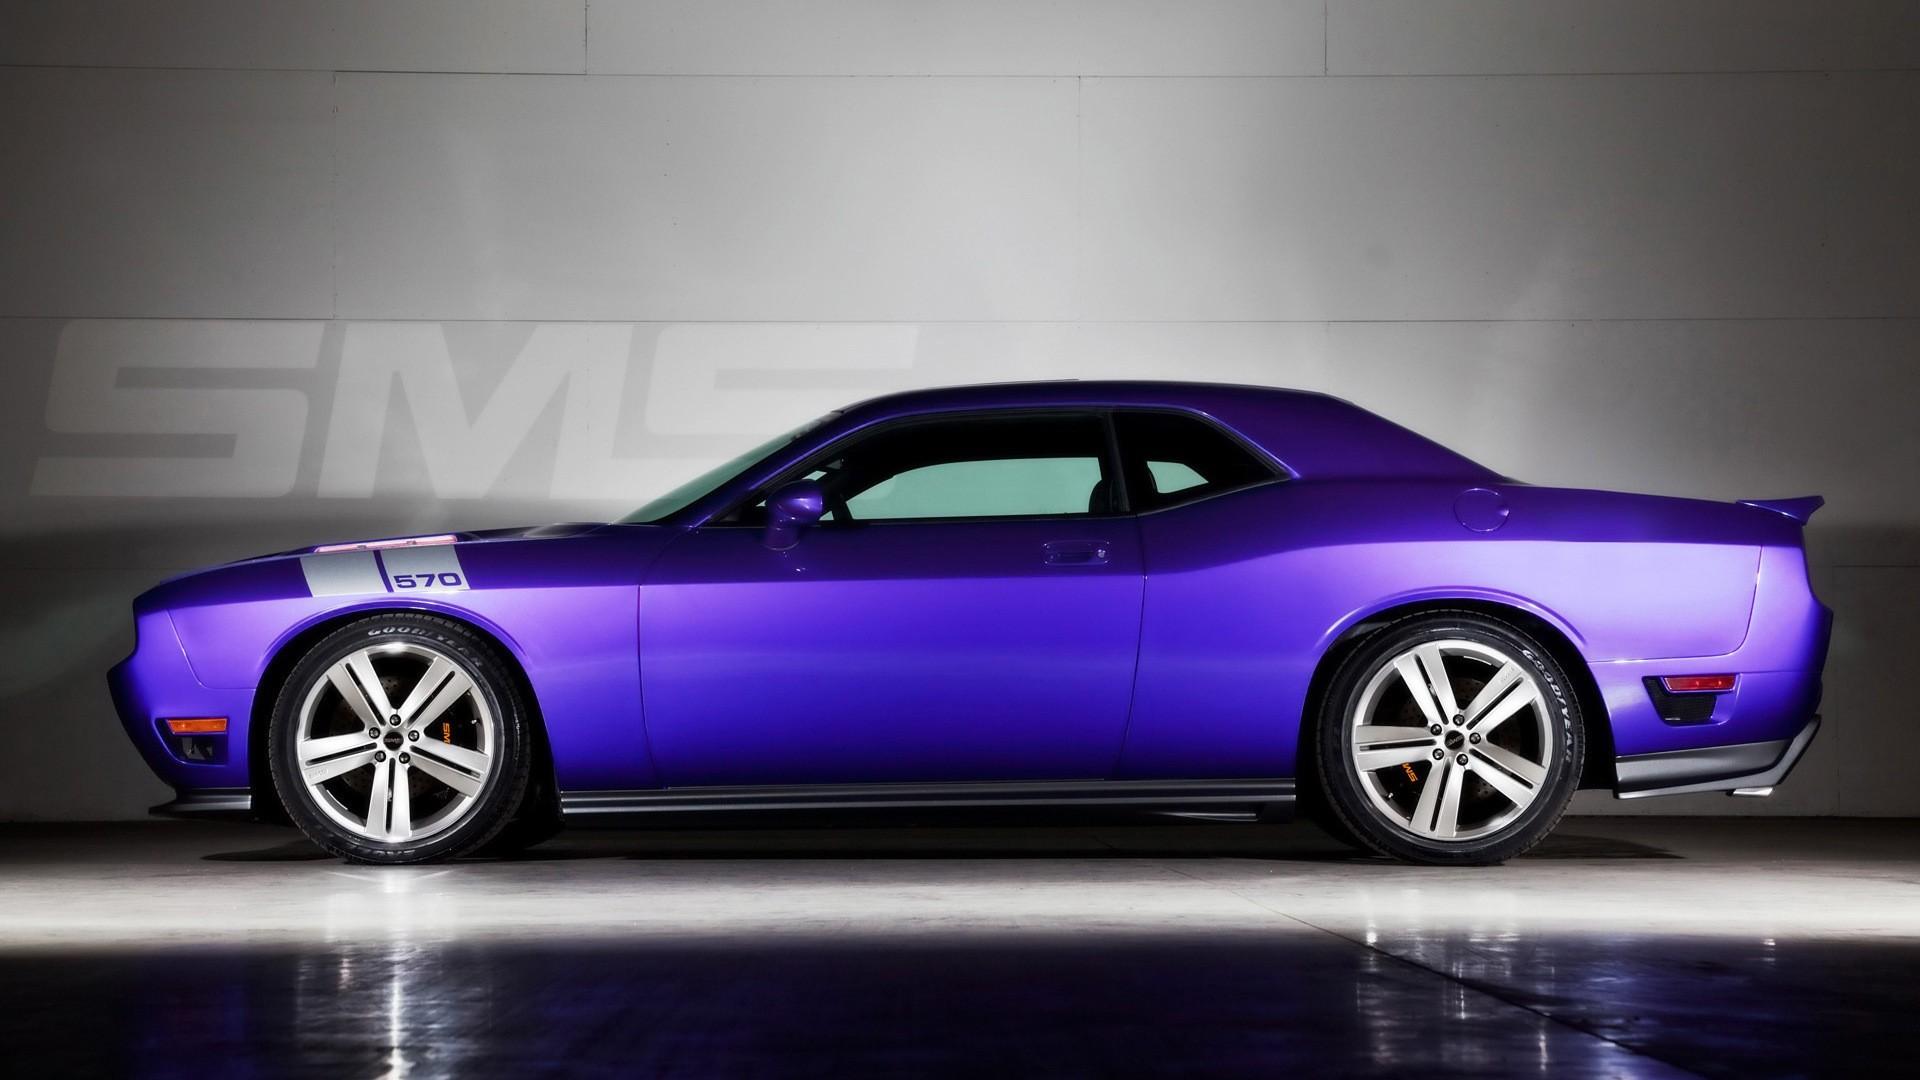 Full Hd Backgrounds 1080p Cars Desktop Desktop Images - Full Hd Car 1080p - HD Wallpaper